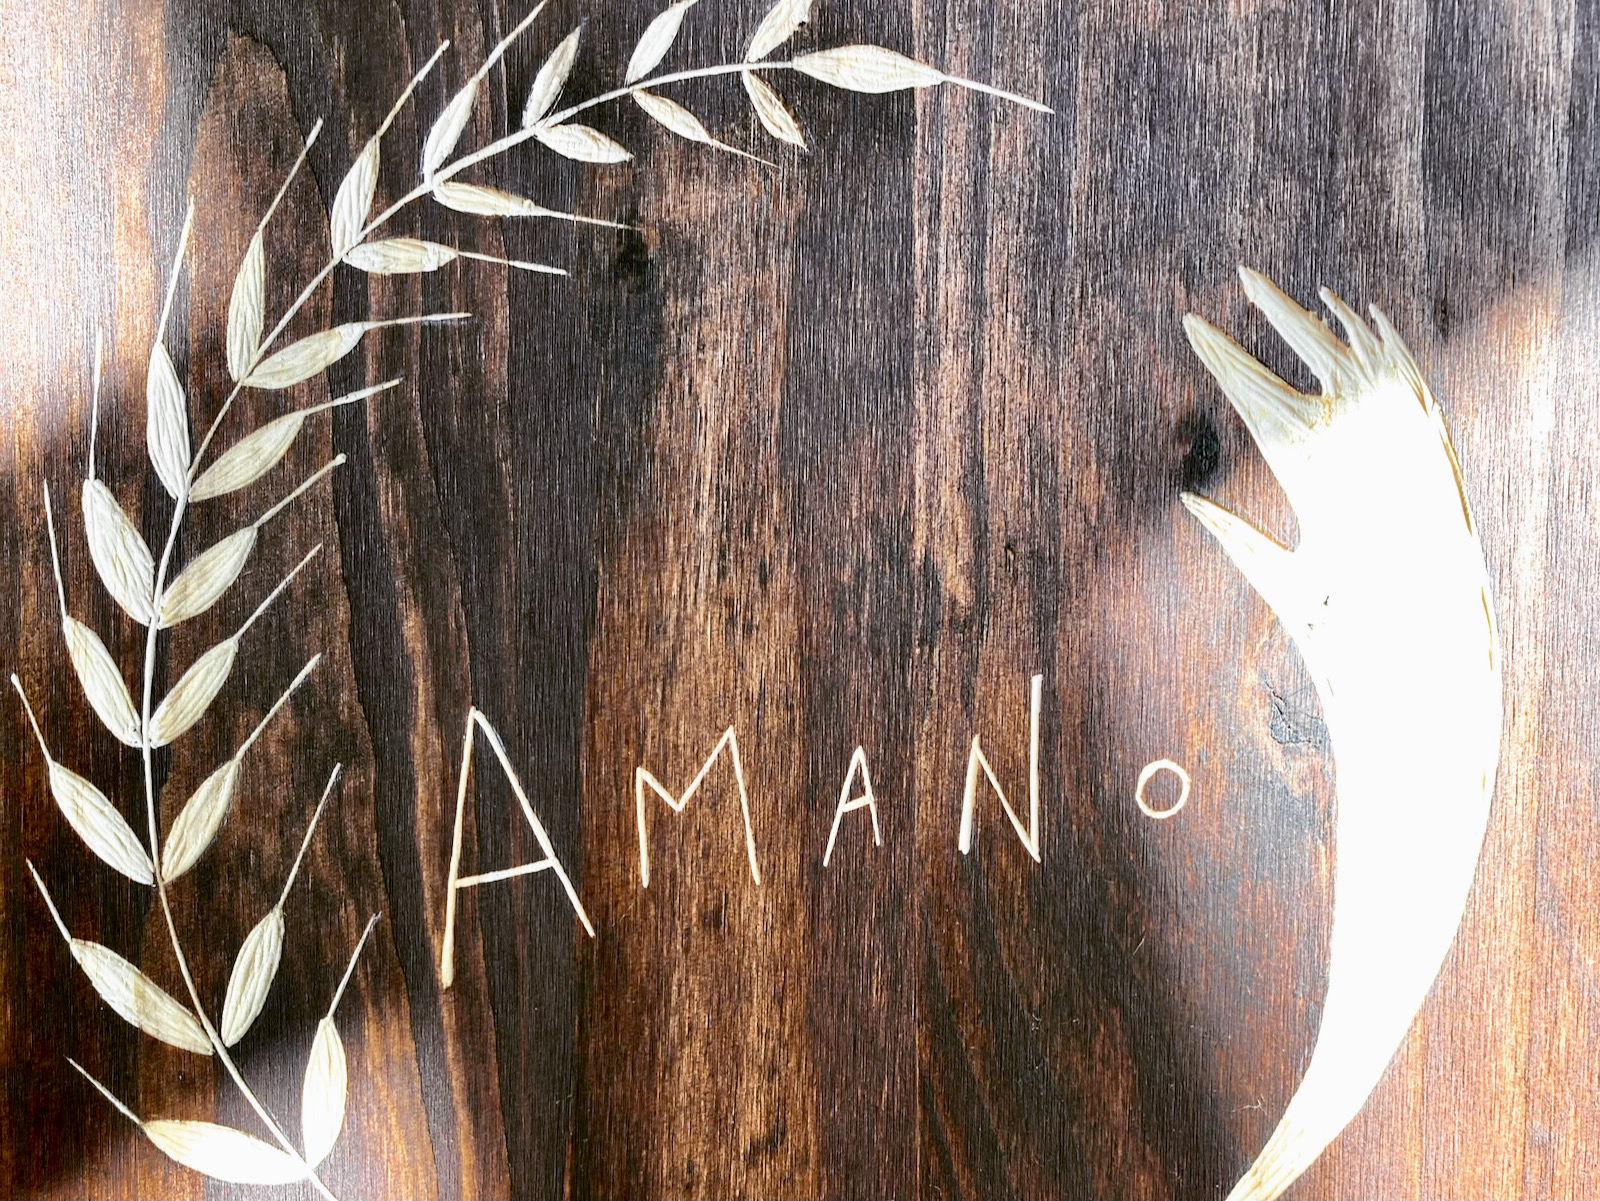 Amano Pan logo on wood